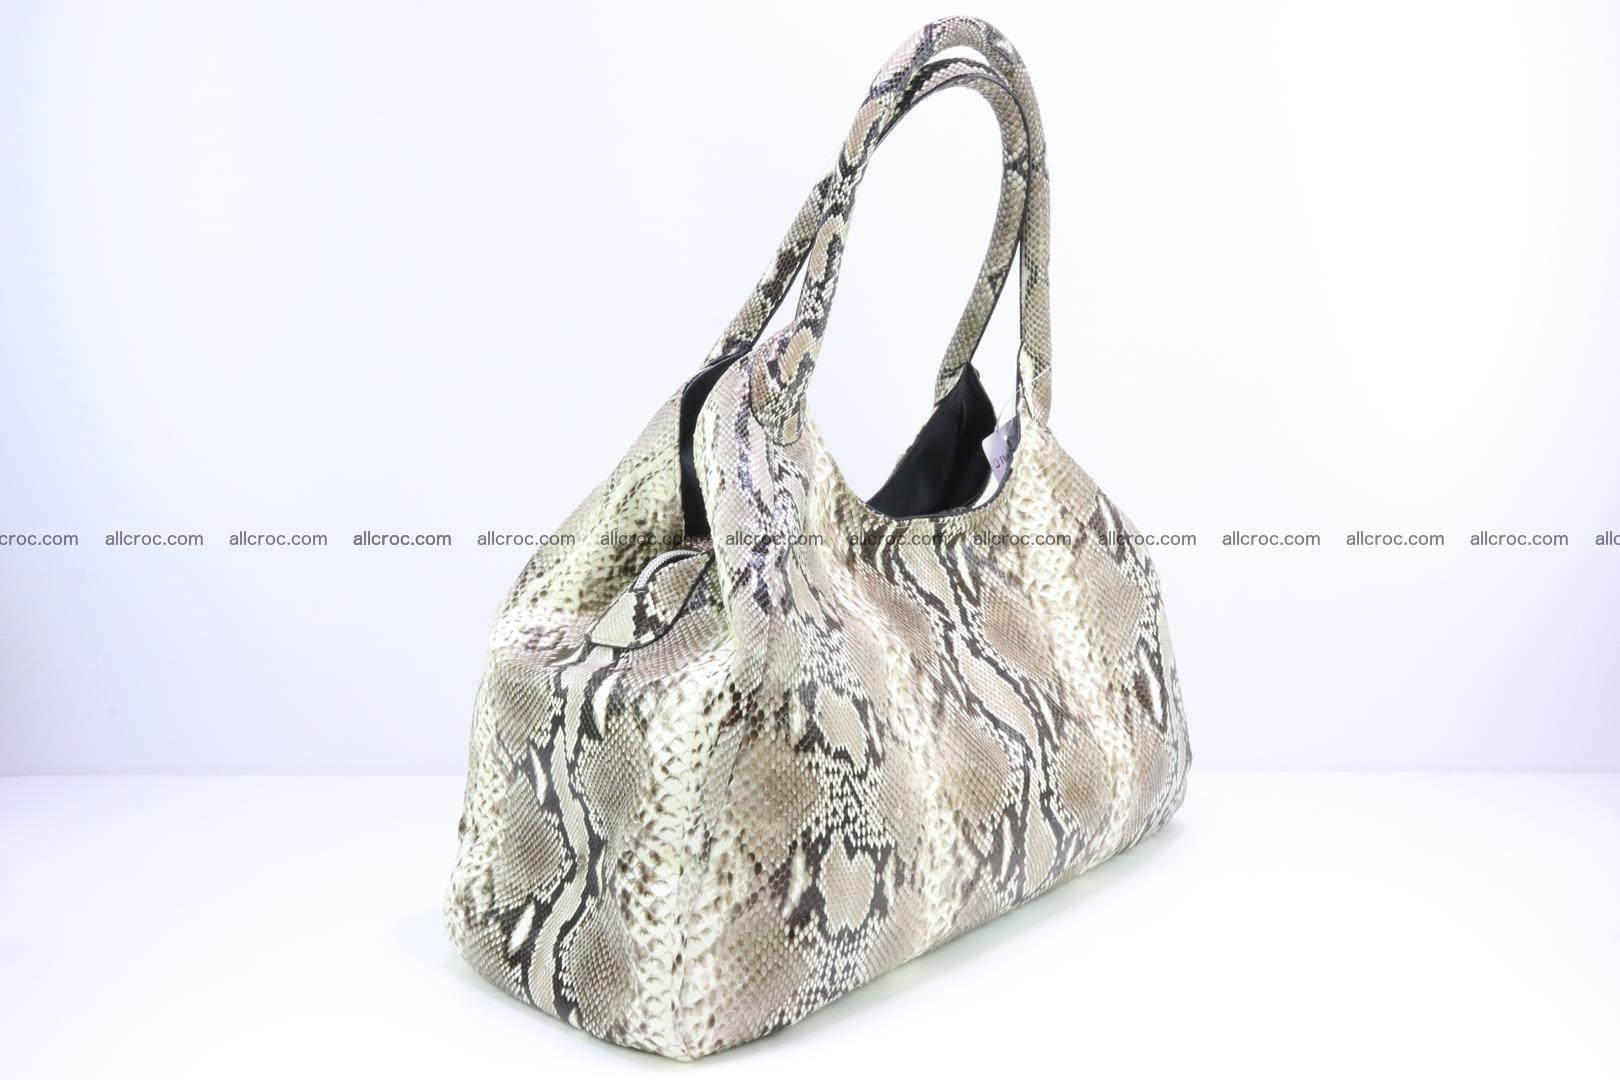 Python skin handbag for lady from genuine Python skin 197 Foto 1